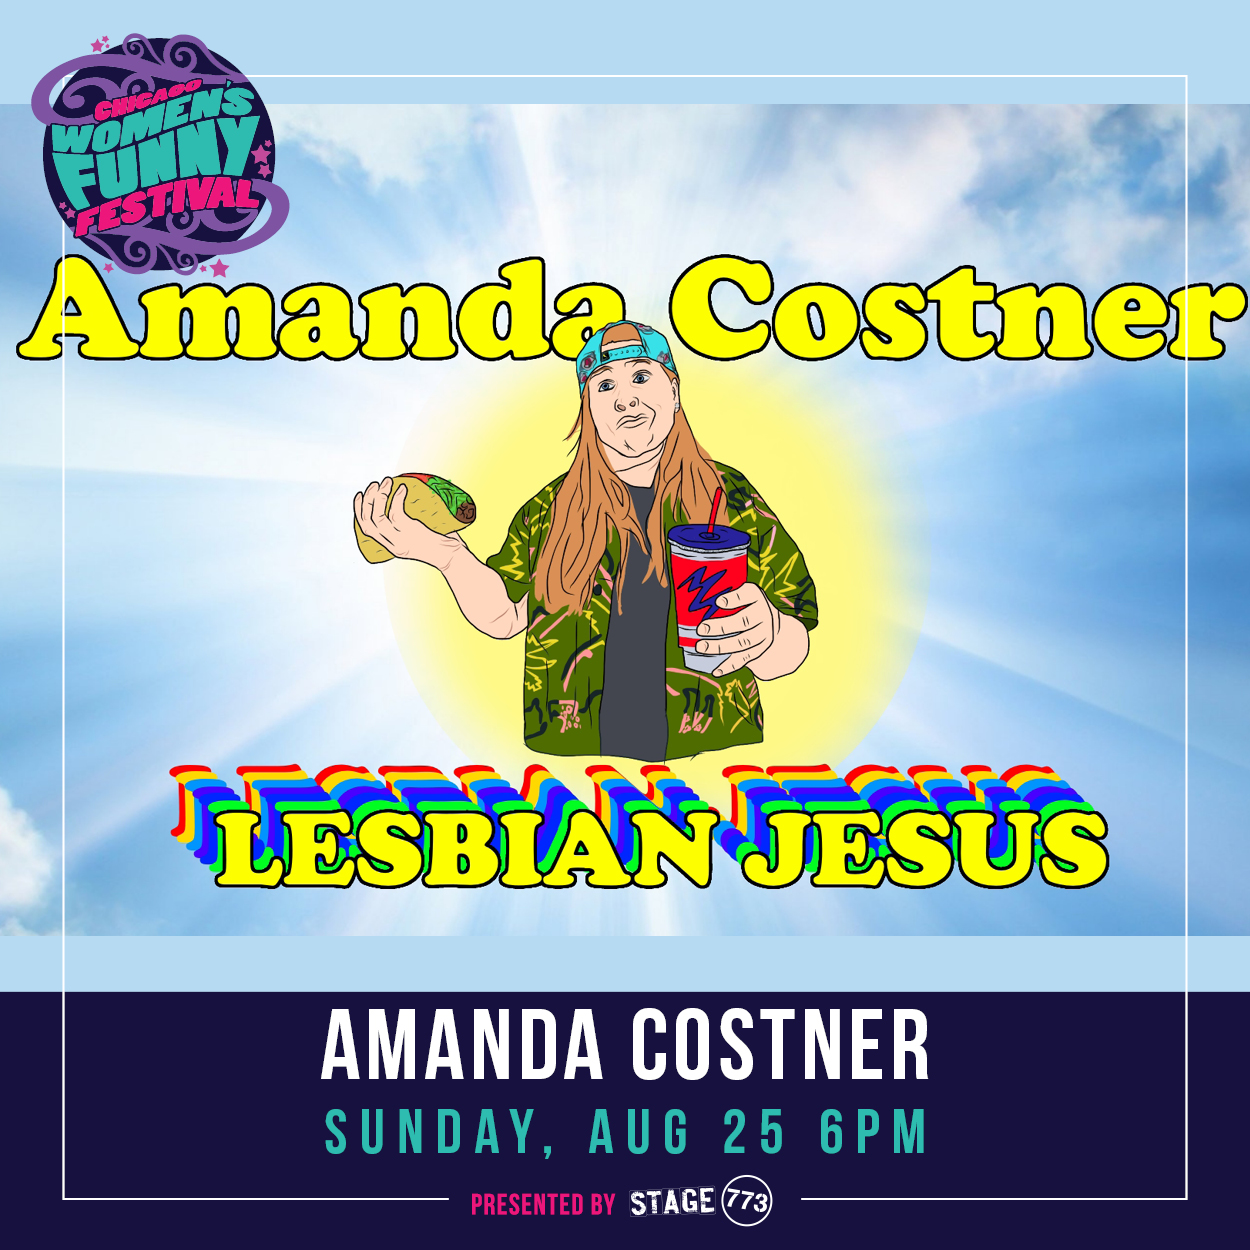 AmandaCostner_Sunday_6PM_CWFF20196.jpg